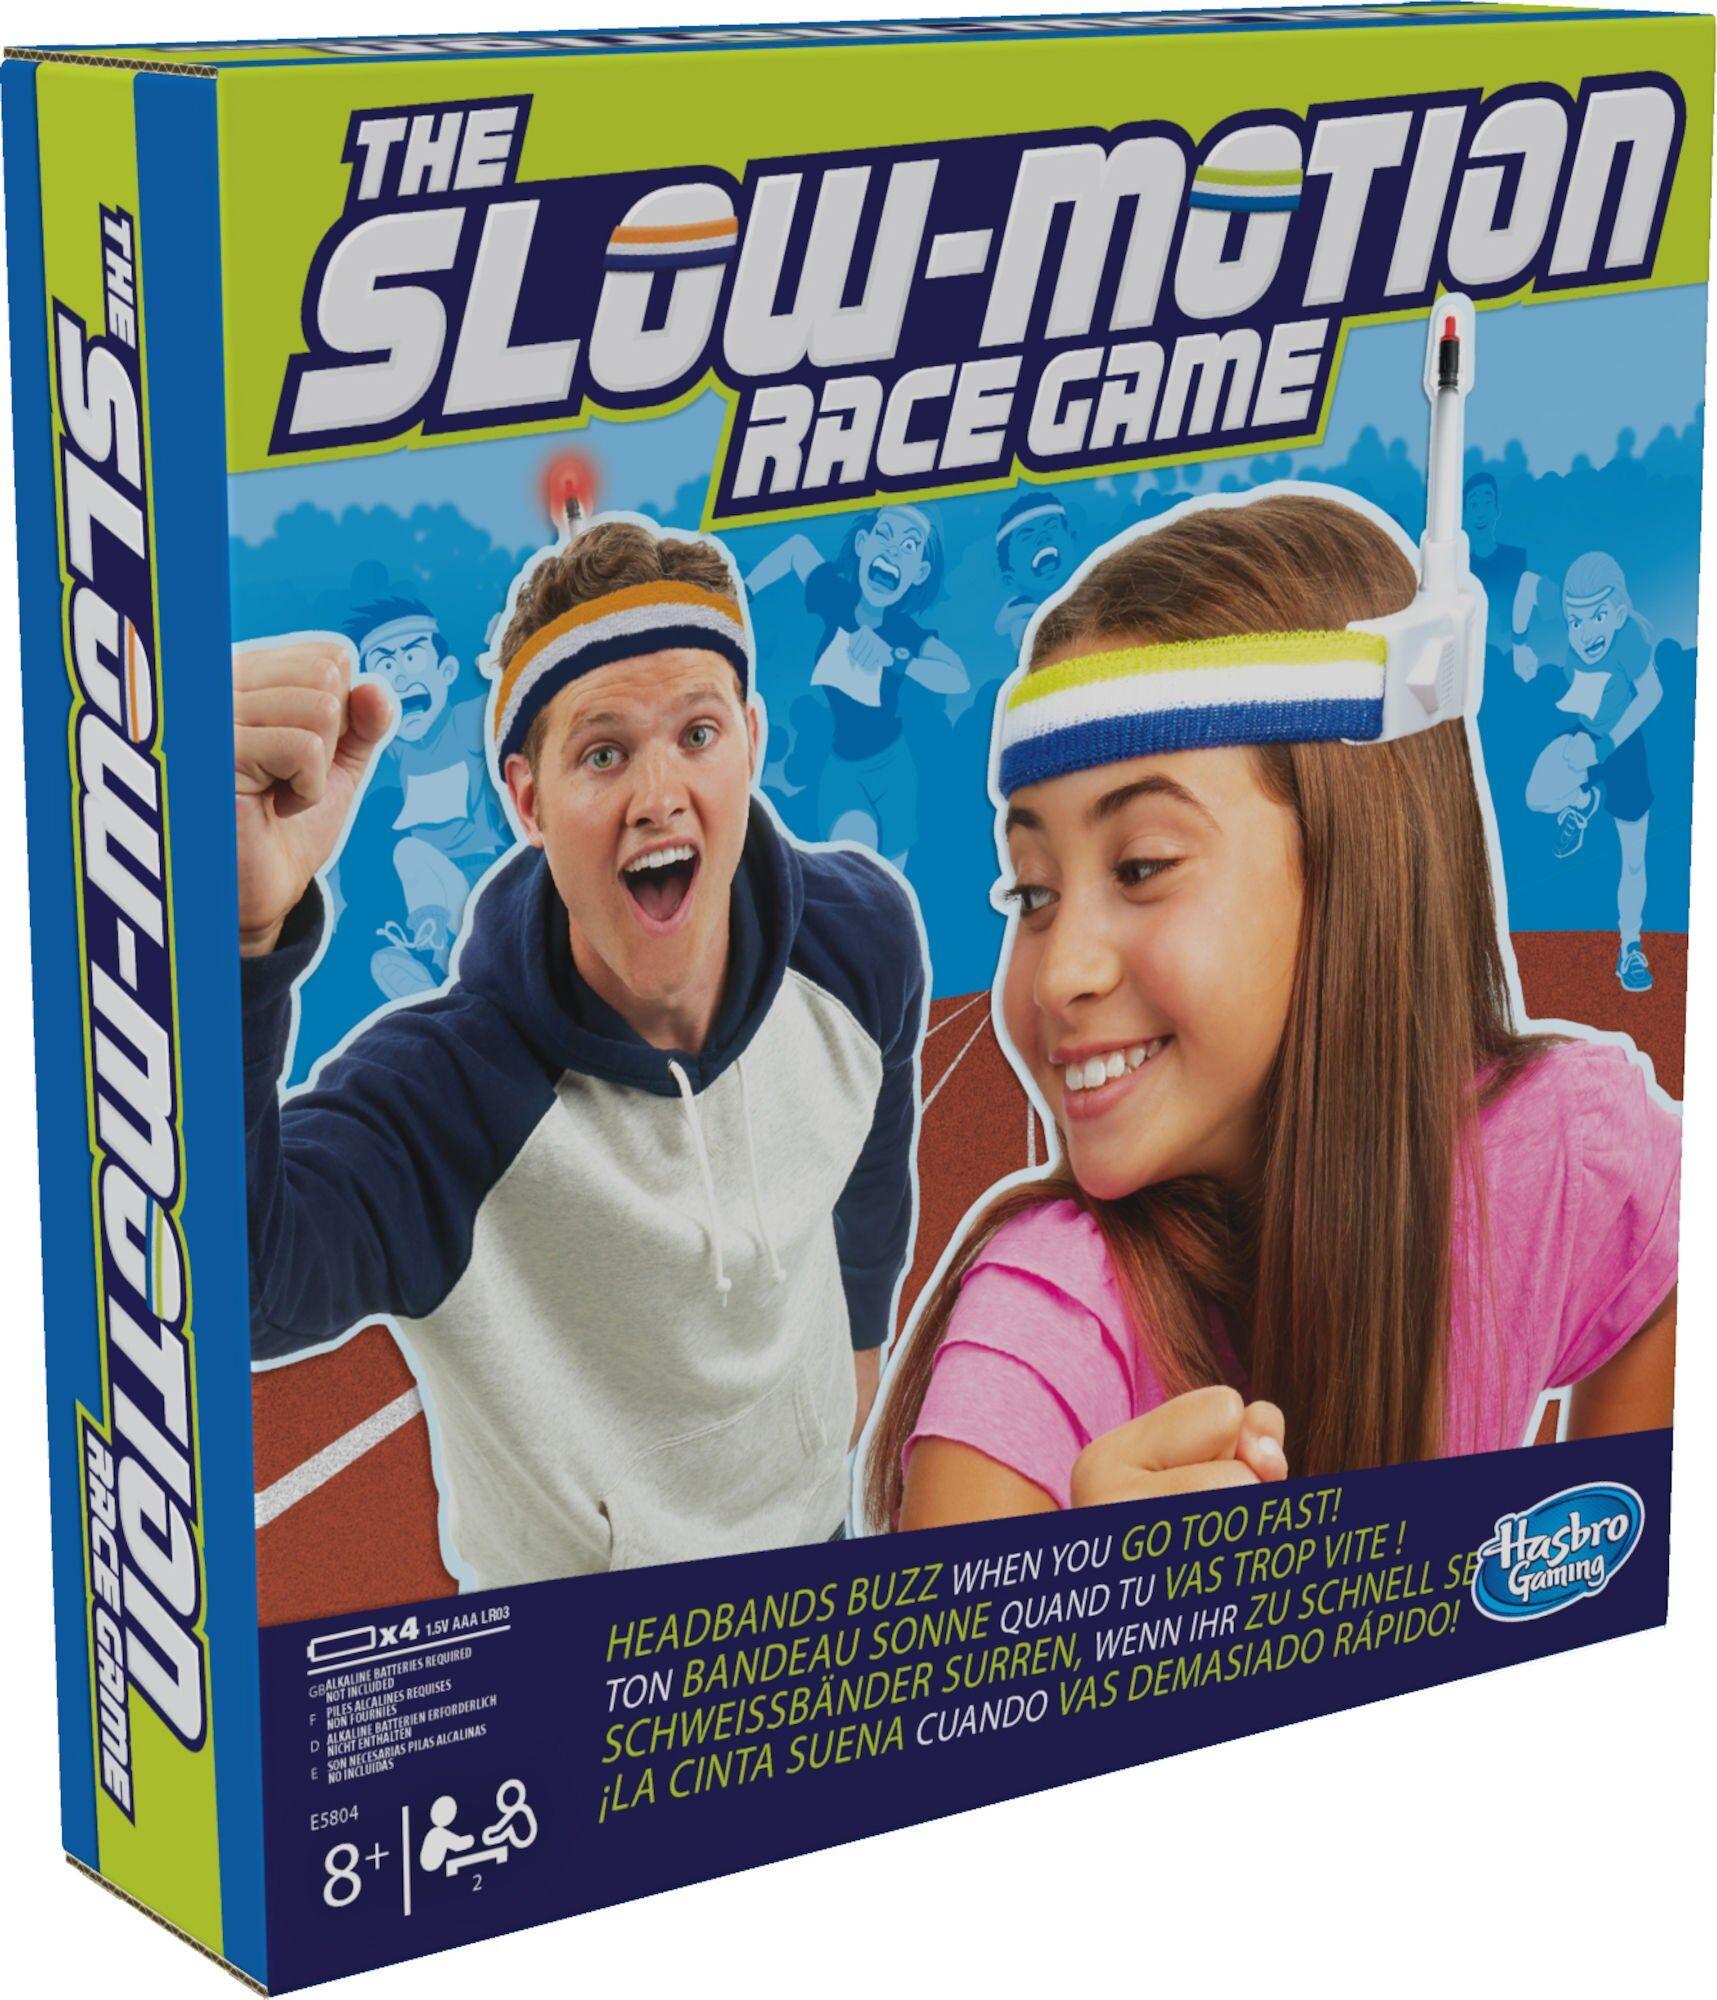 Hasbro The Slow-Motion Race